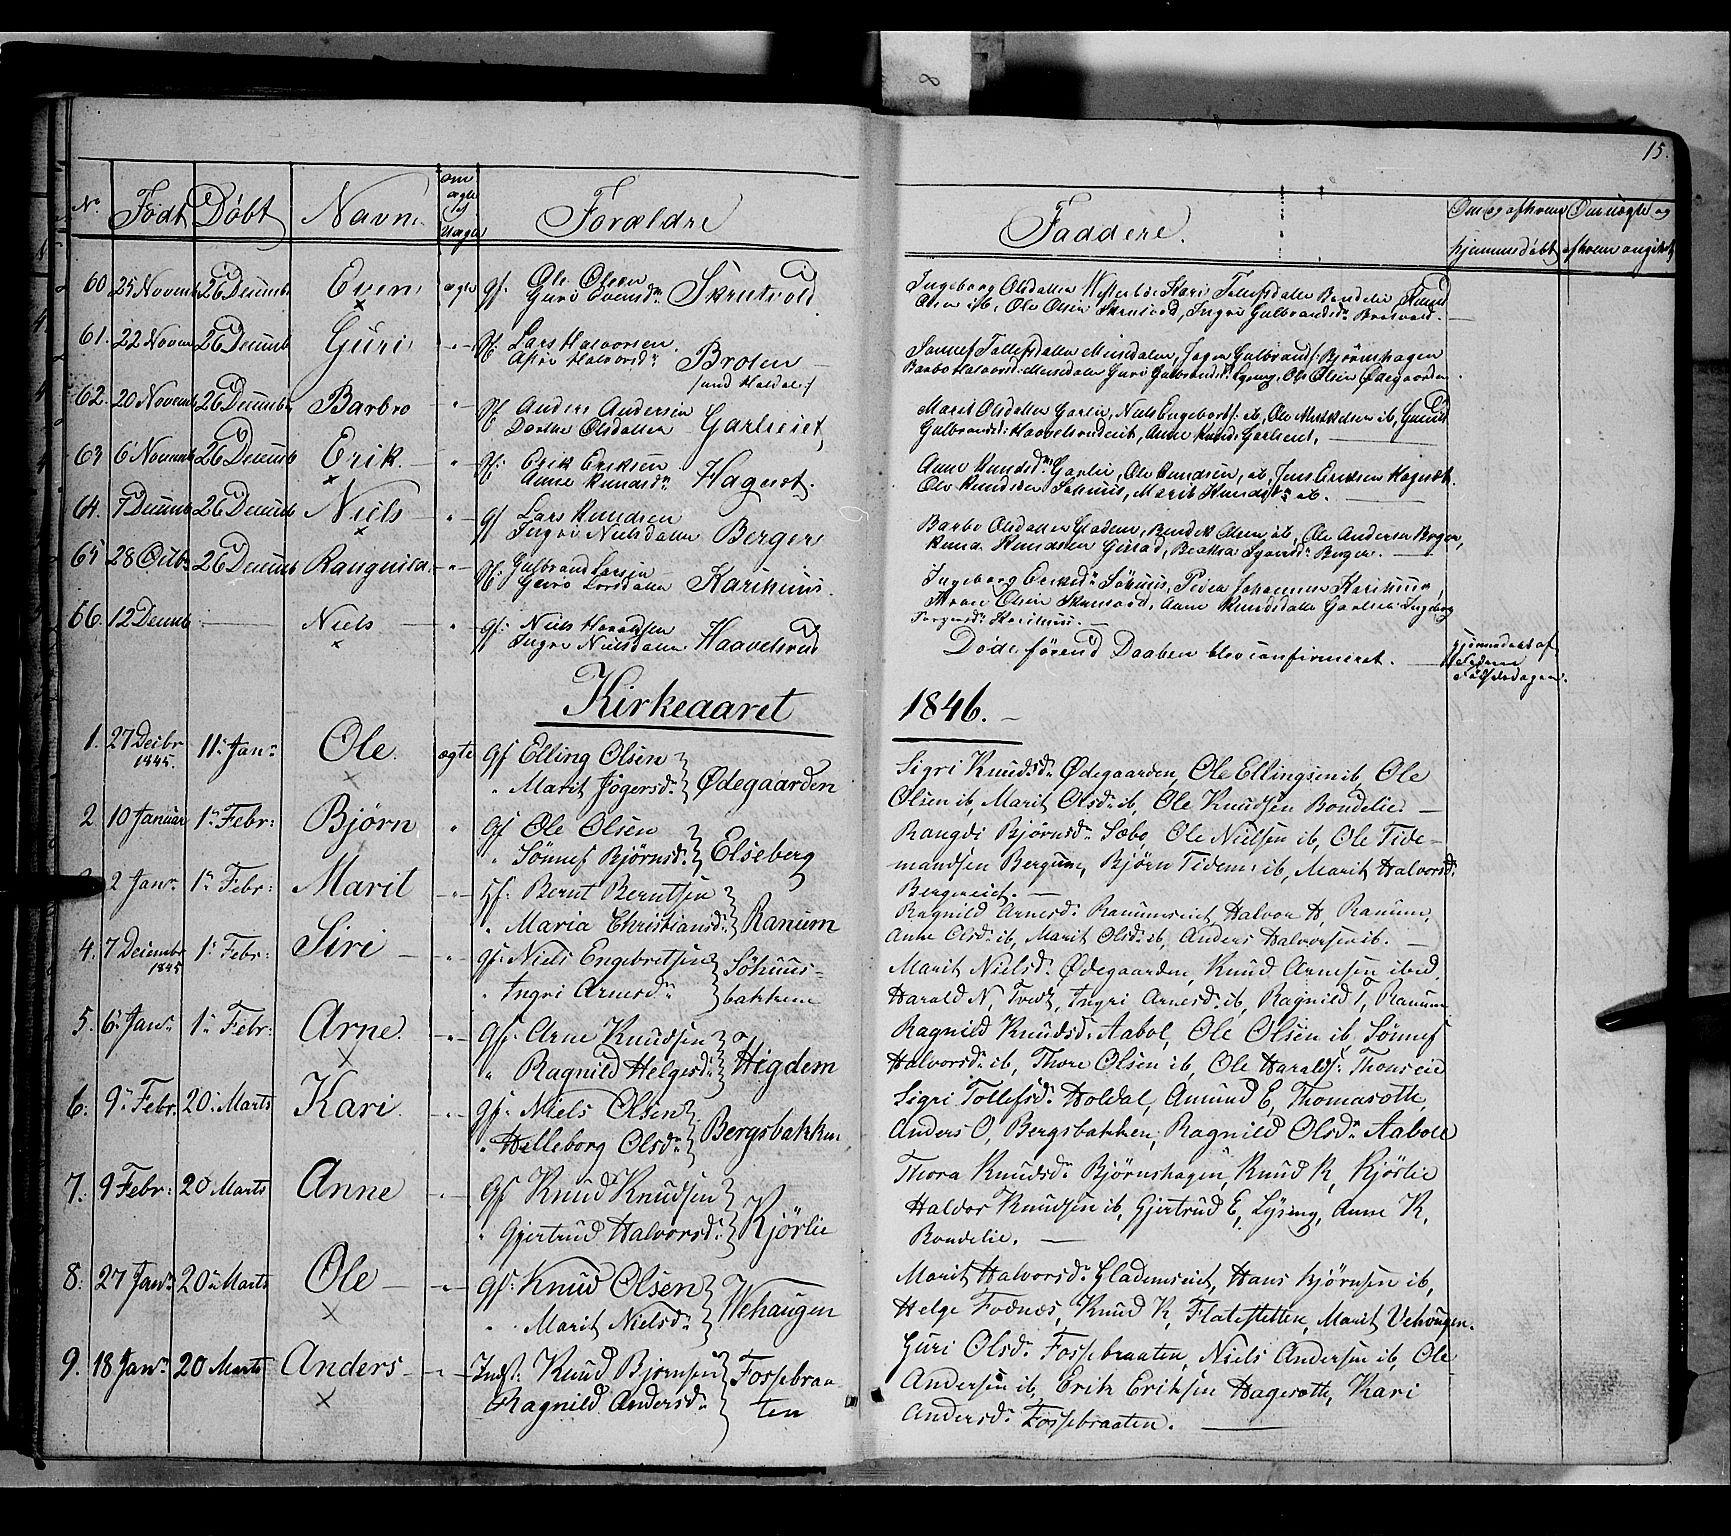 SAH, Nord-Aurdal prestekontor, Ministerialbok nr. 7, 1842-1863, s. 15